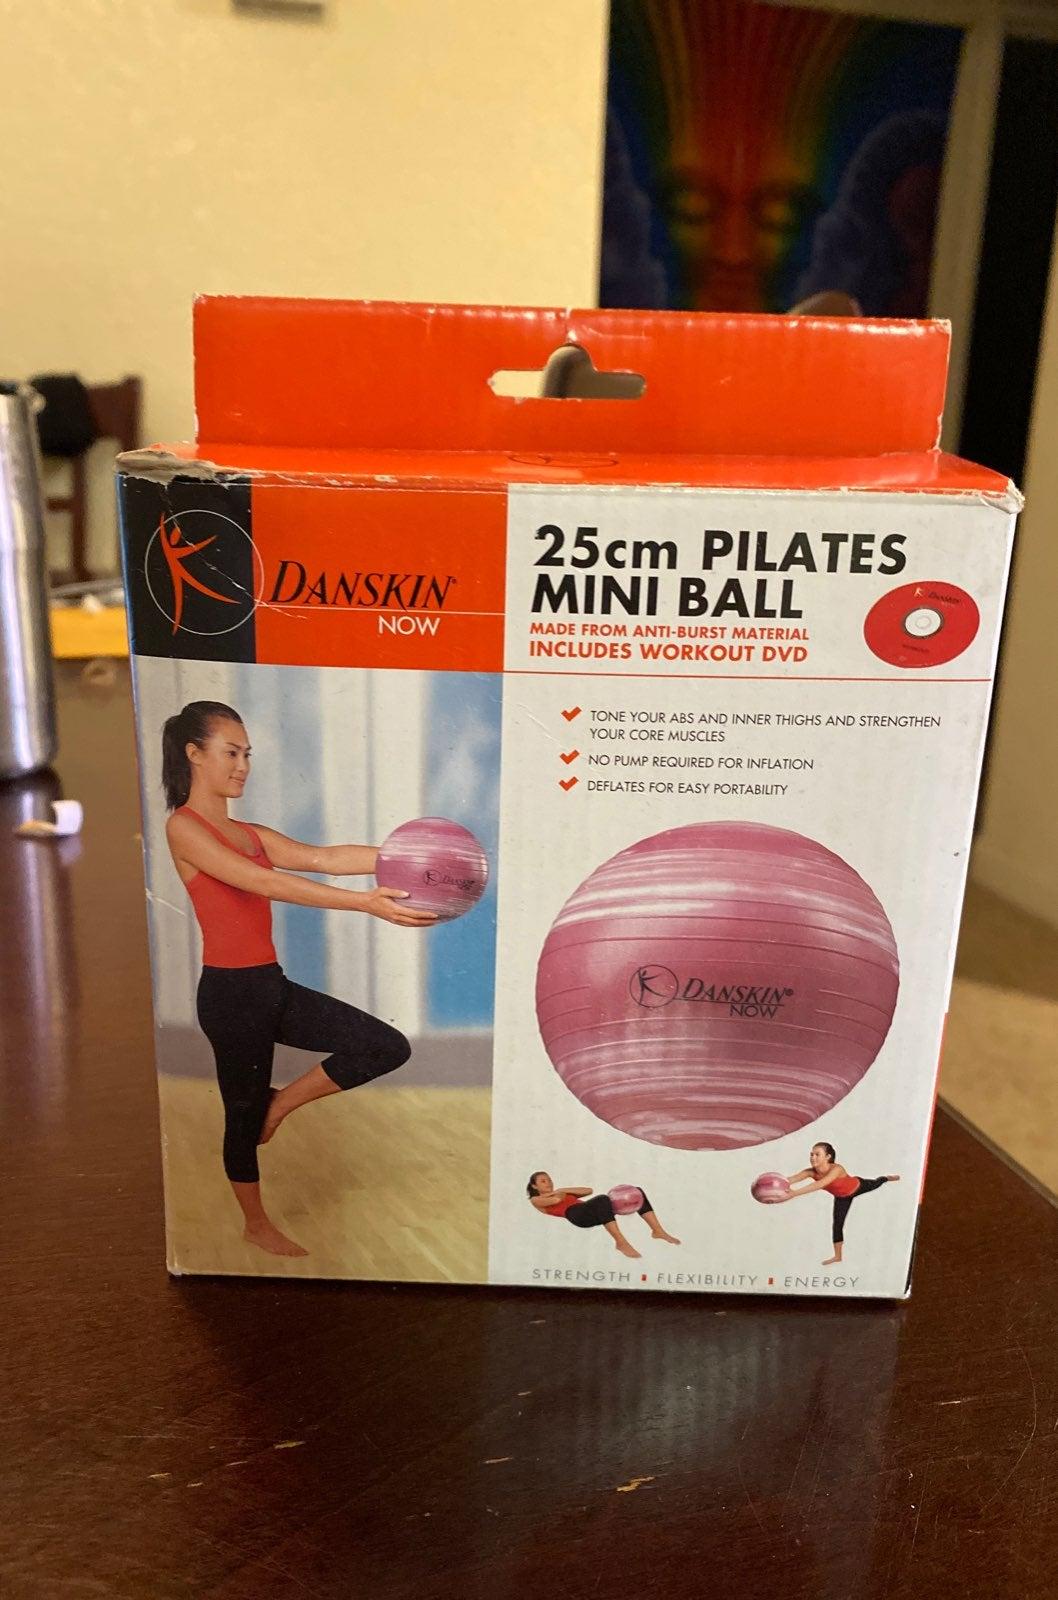 25cm Pilates Mini Ball (Plus Workout DVD